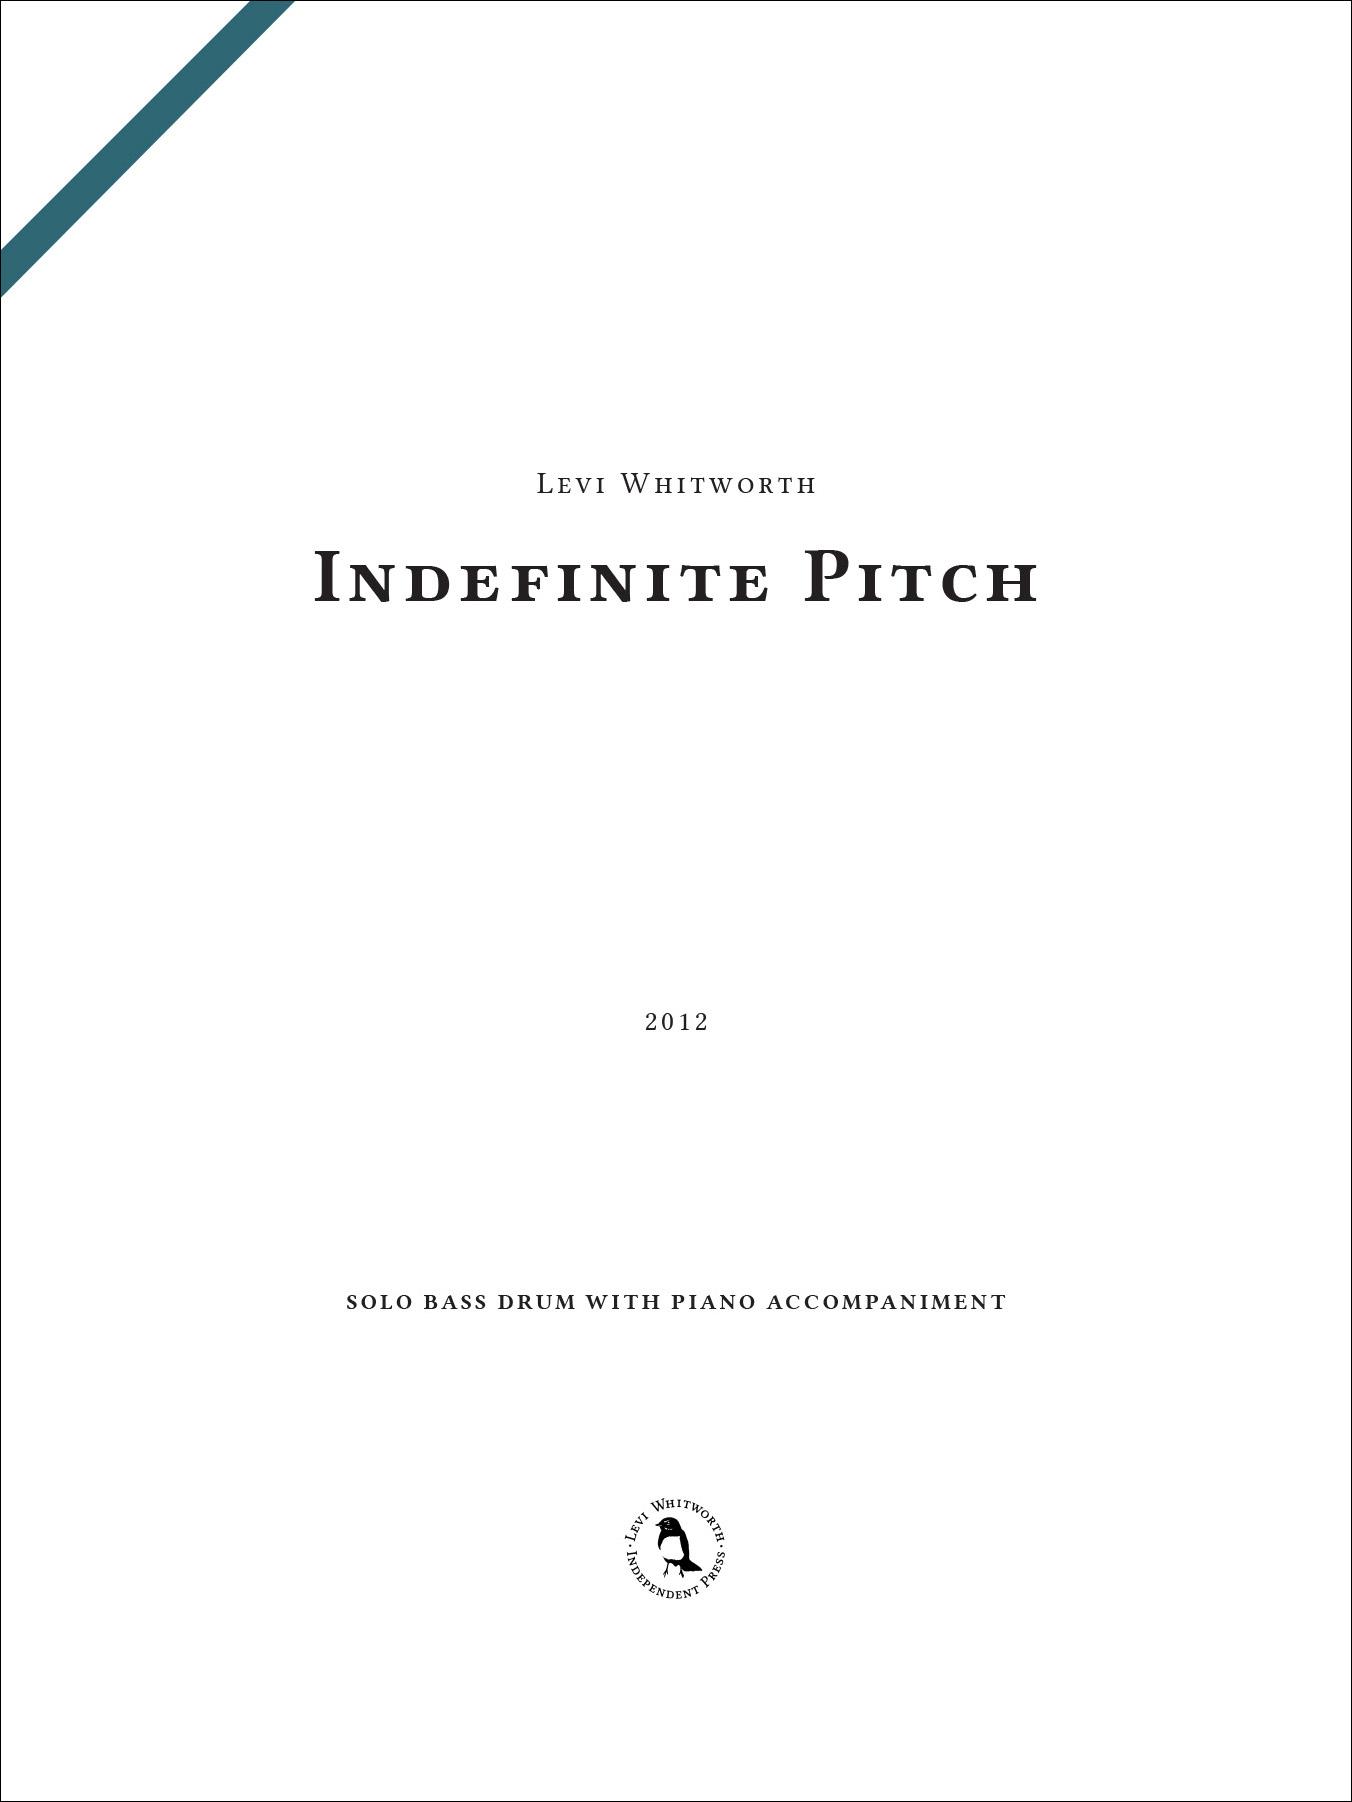 Indefinite Pitch